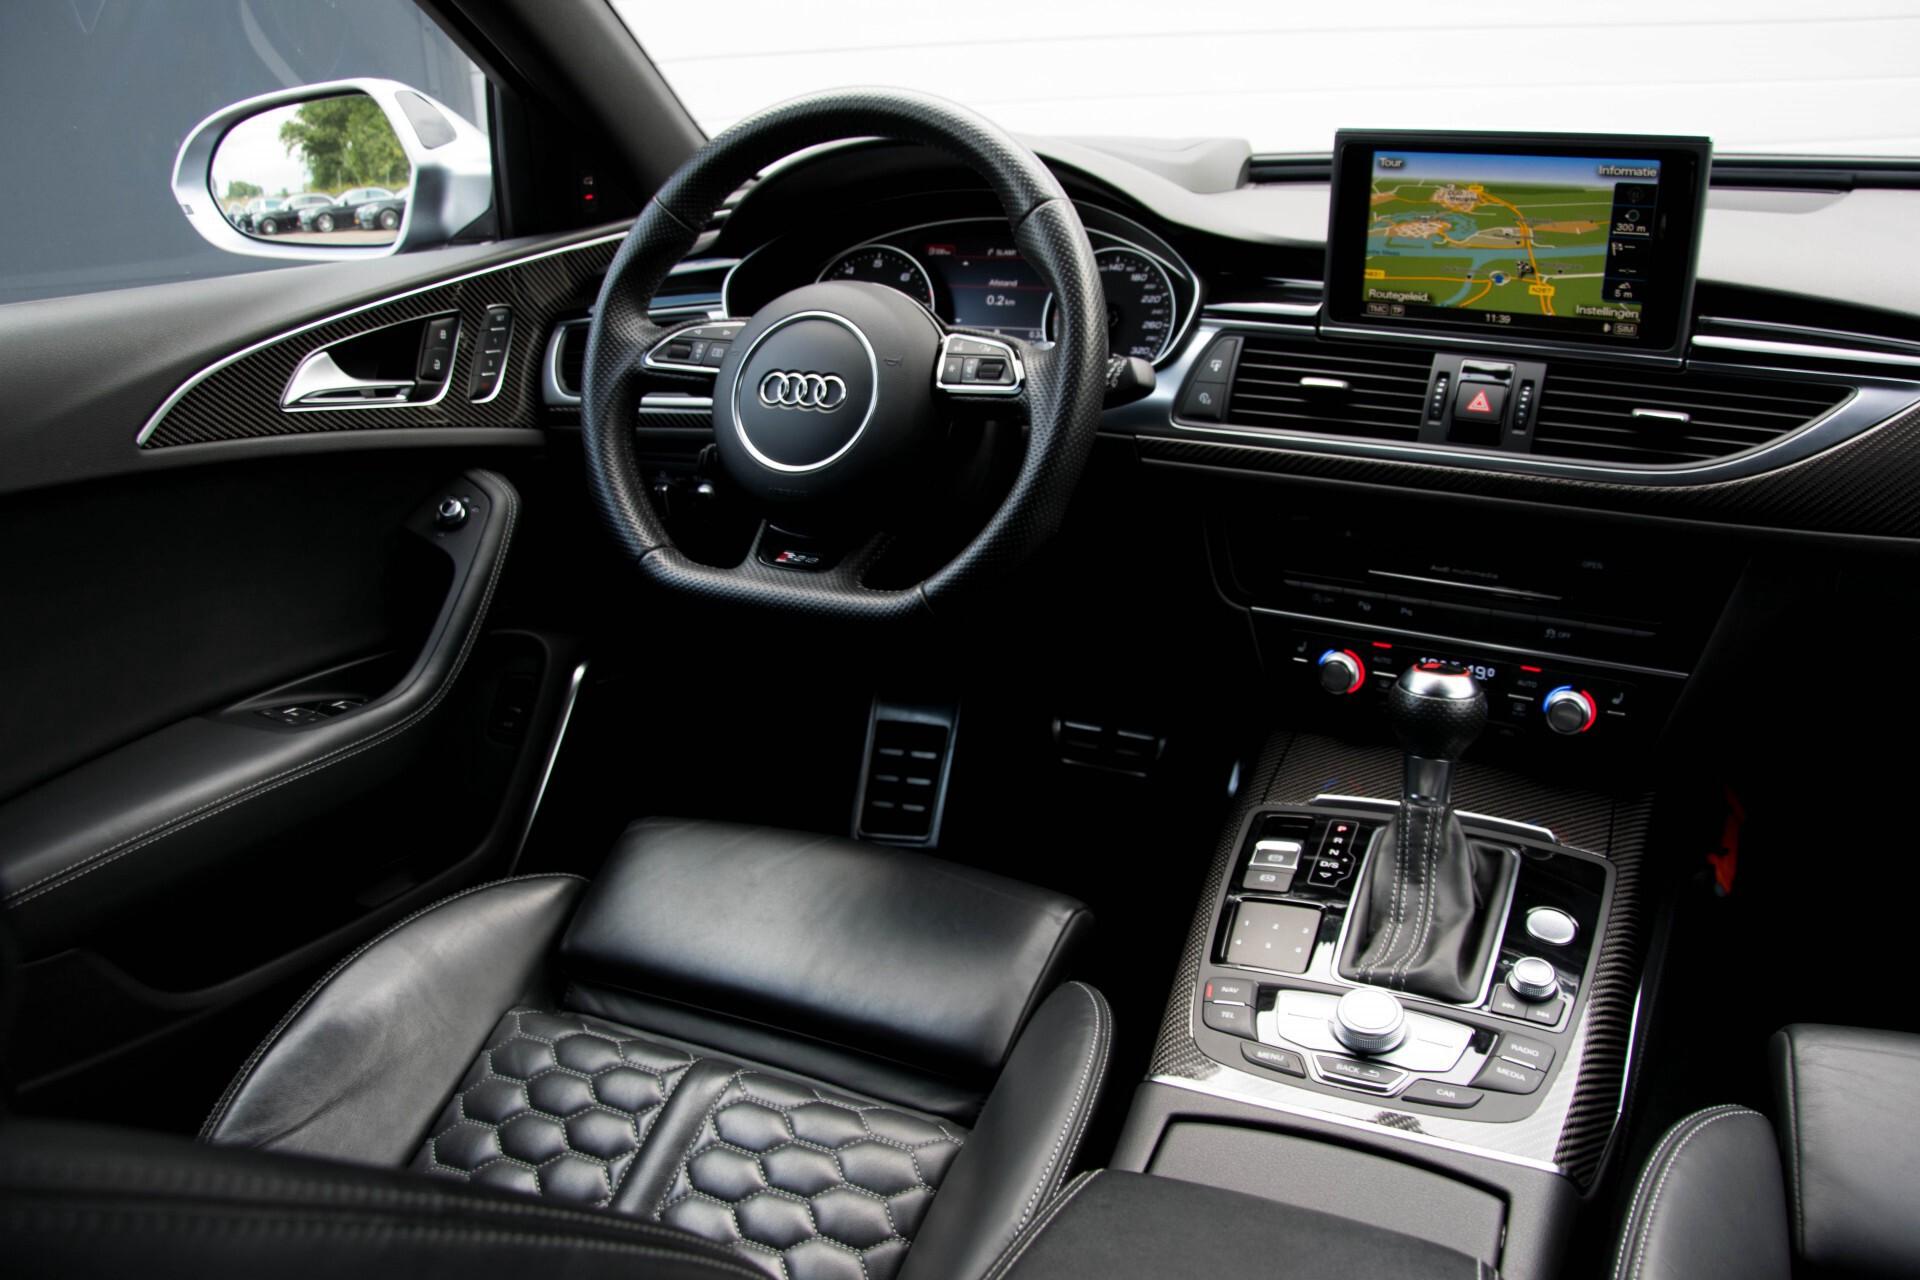 Audi RS6 Avant 4.0 TFSI Quattro B&O/Carbon/Head-Up/Nachtzicht/Exclusive/Camera/Keyless/Pano Aut8 Foto 7